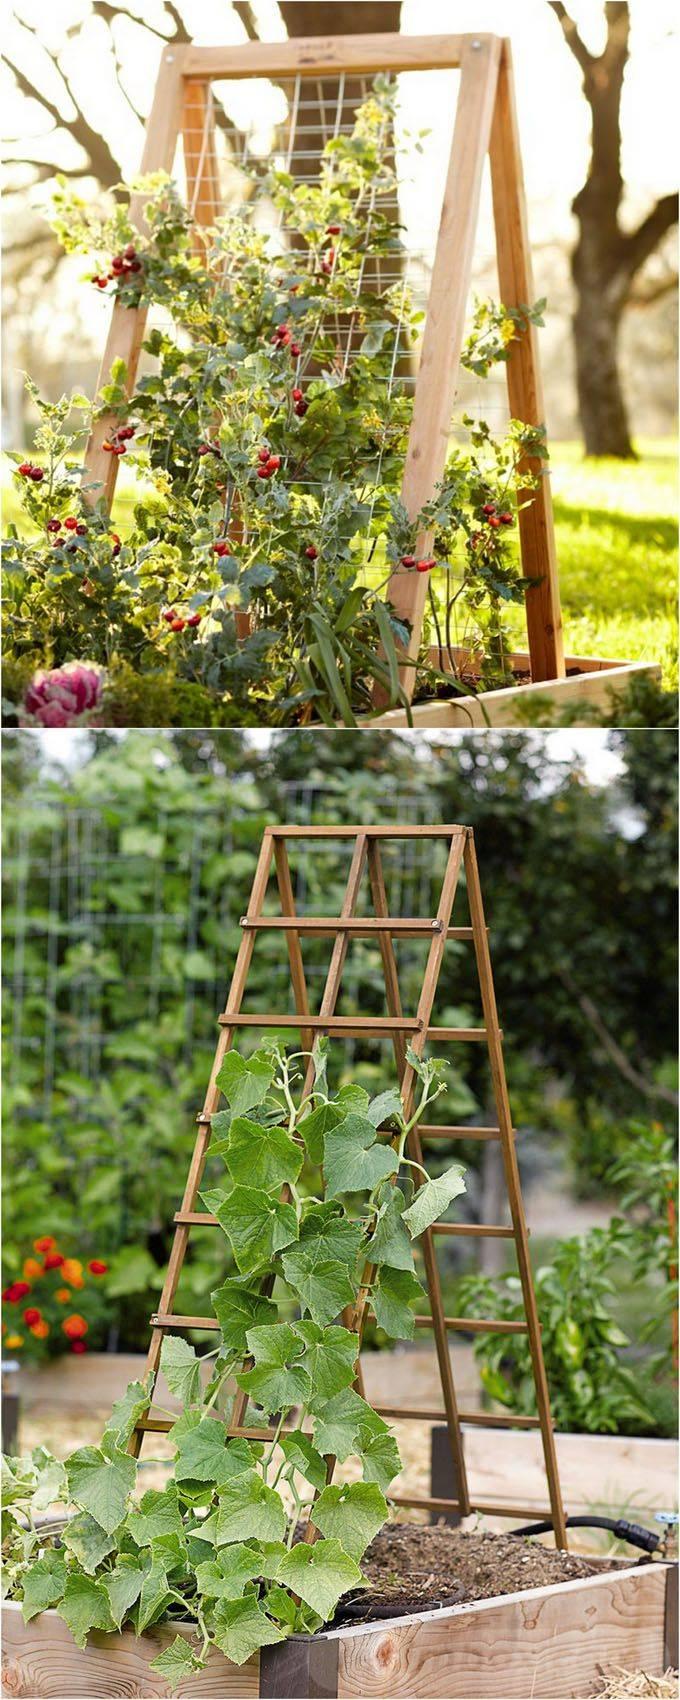 diy garden easy-98657048068401396